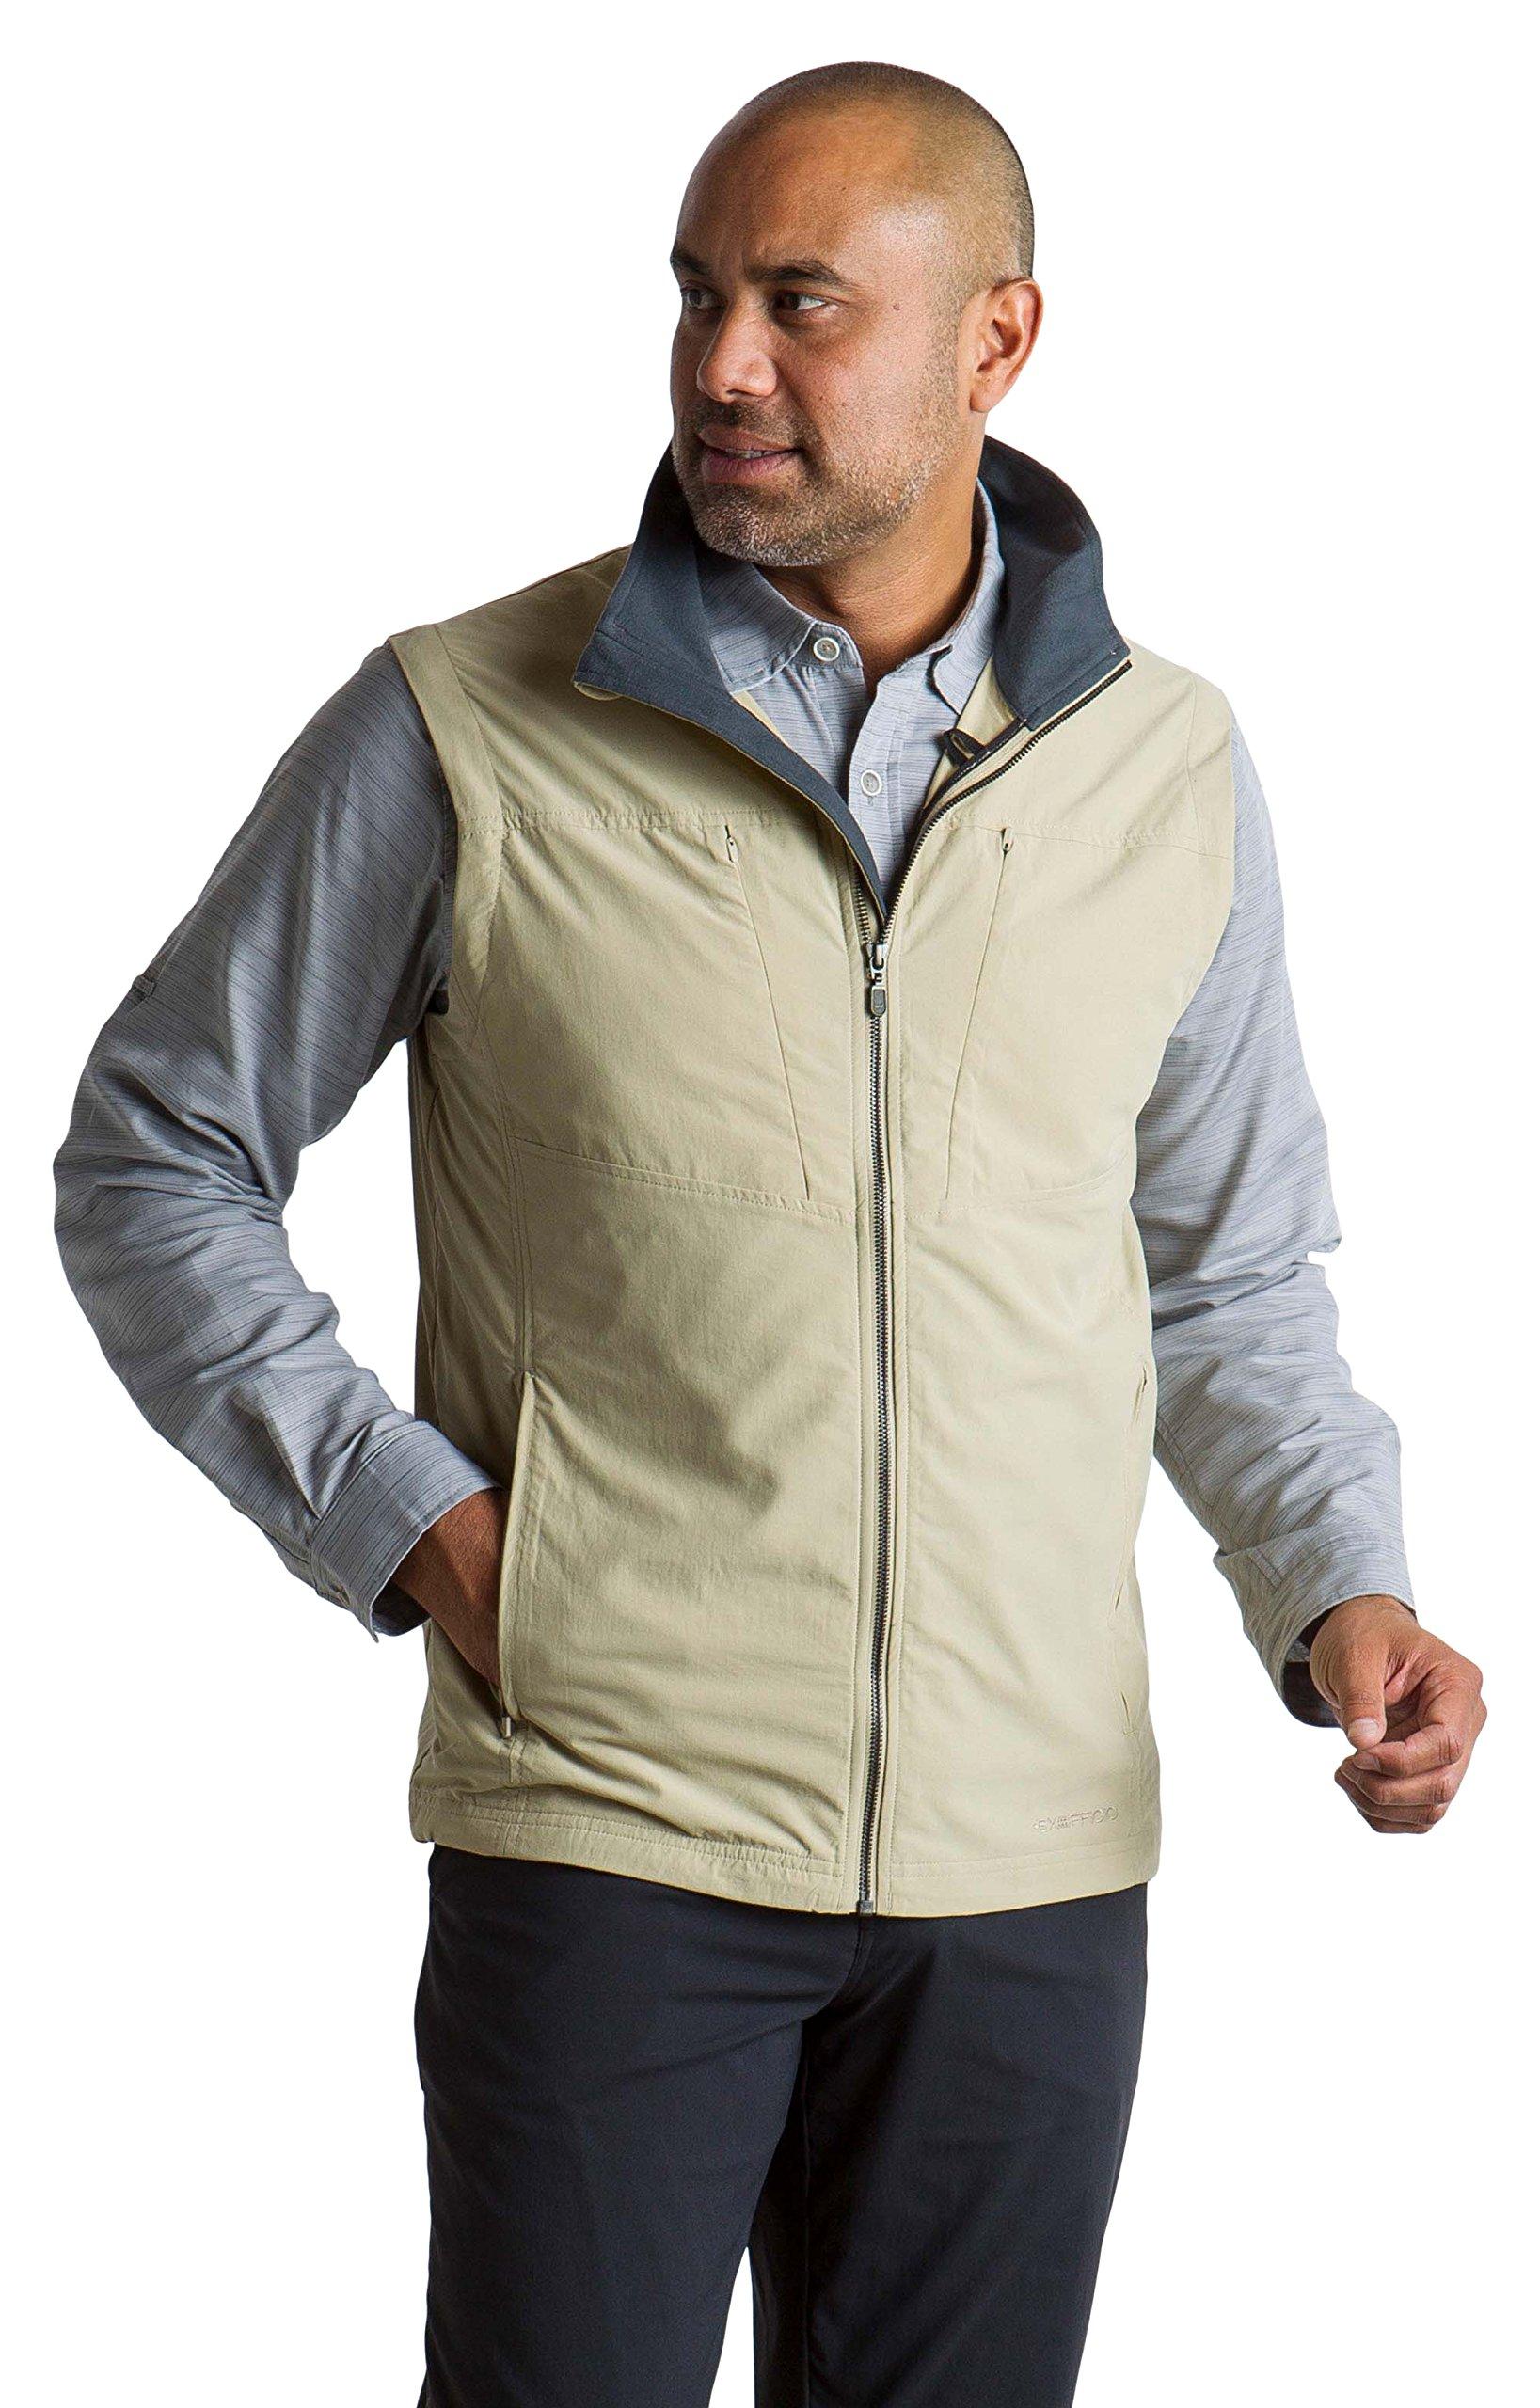 ExOfficio Men's Sol Cool FlyQ Water-Repellent Travel Vest, Light Khaki, Medium